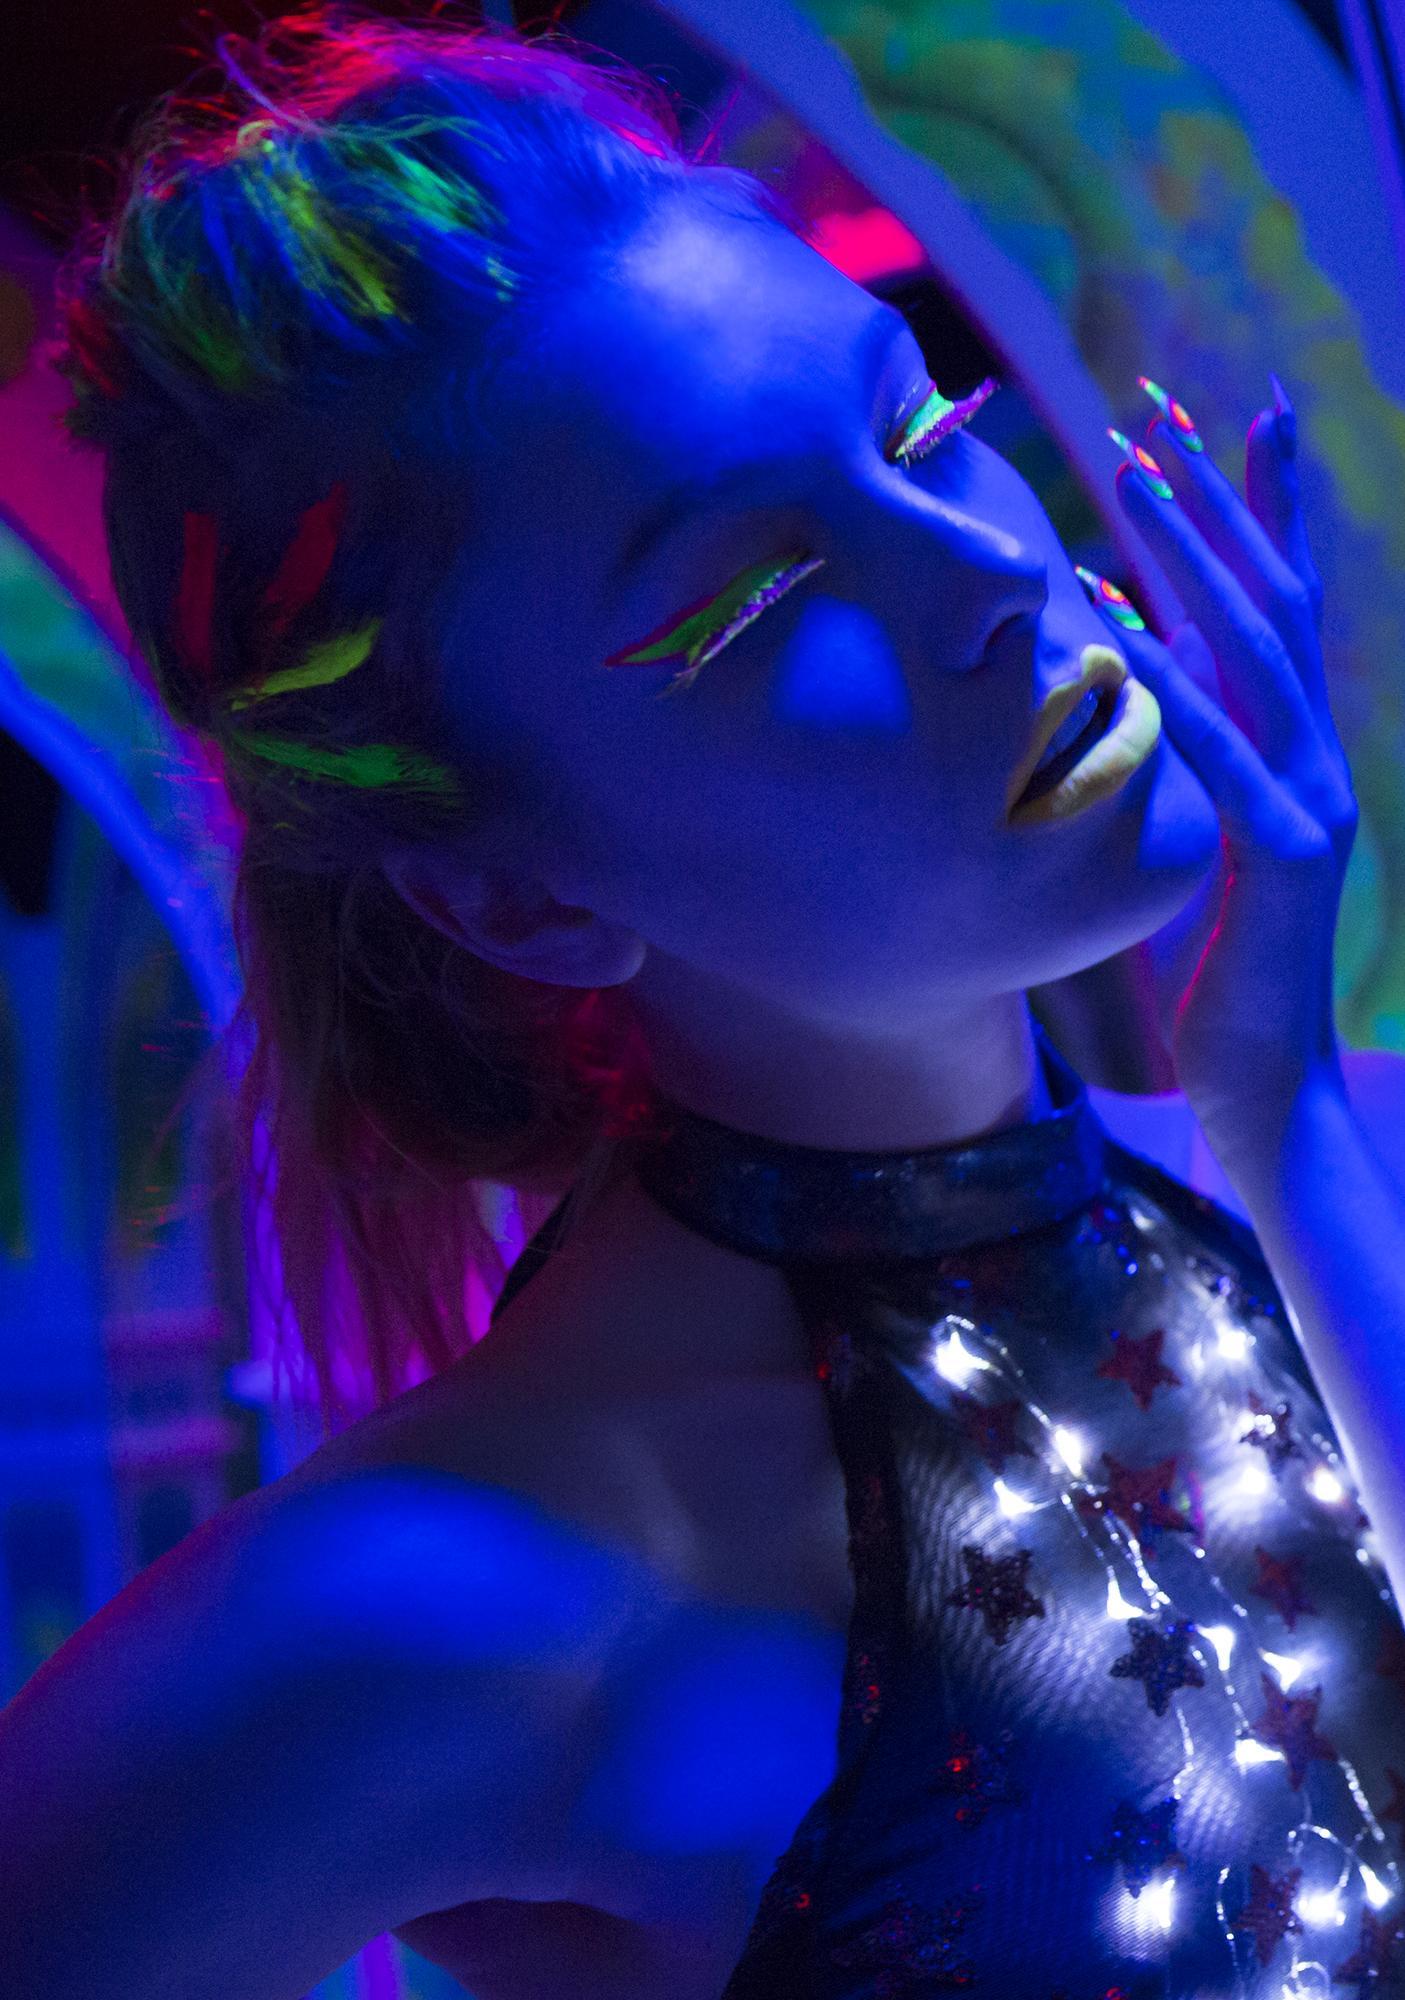 Stargazer Vibrant Sonic Wind UV Neon Mascara